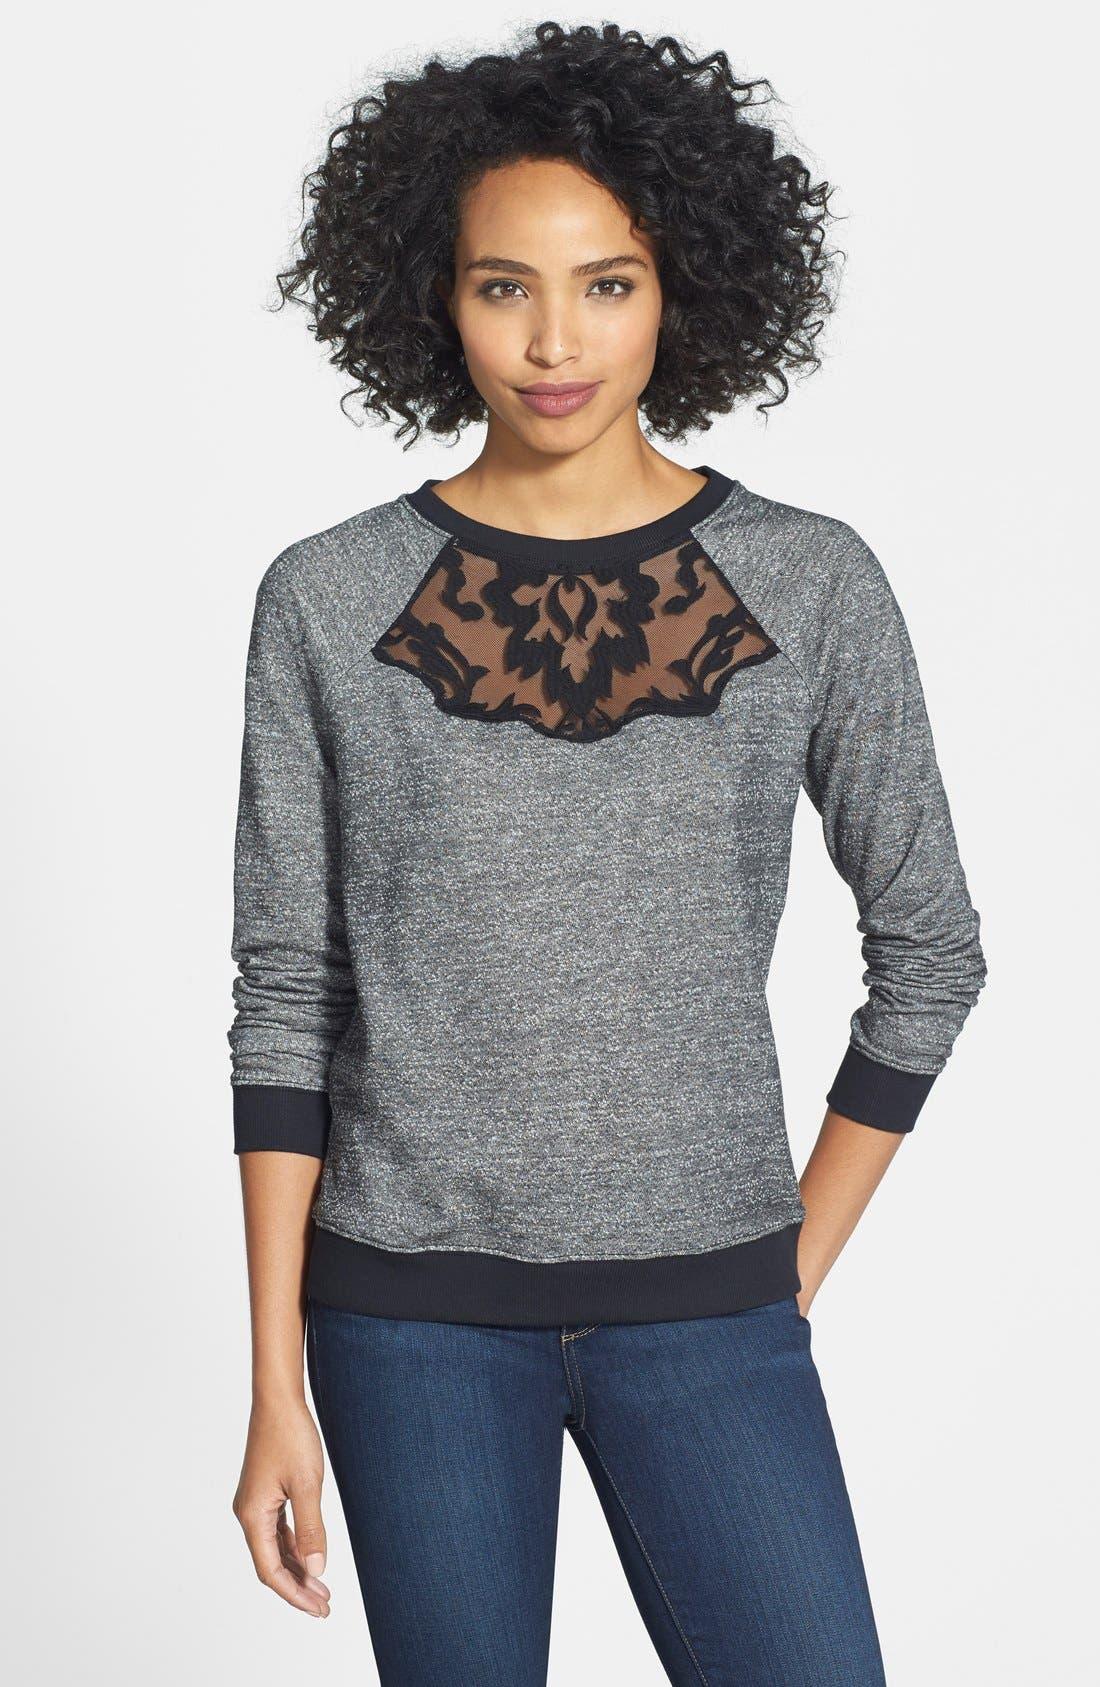 Main Image - NYDJ Embroidered Lace Crewneck Sweatshirt